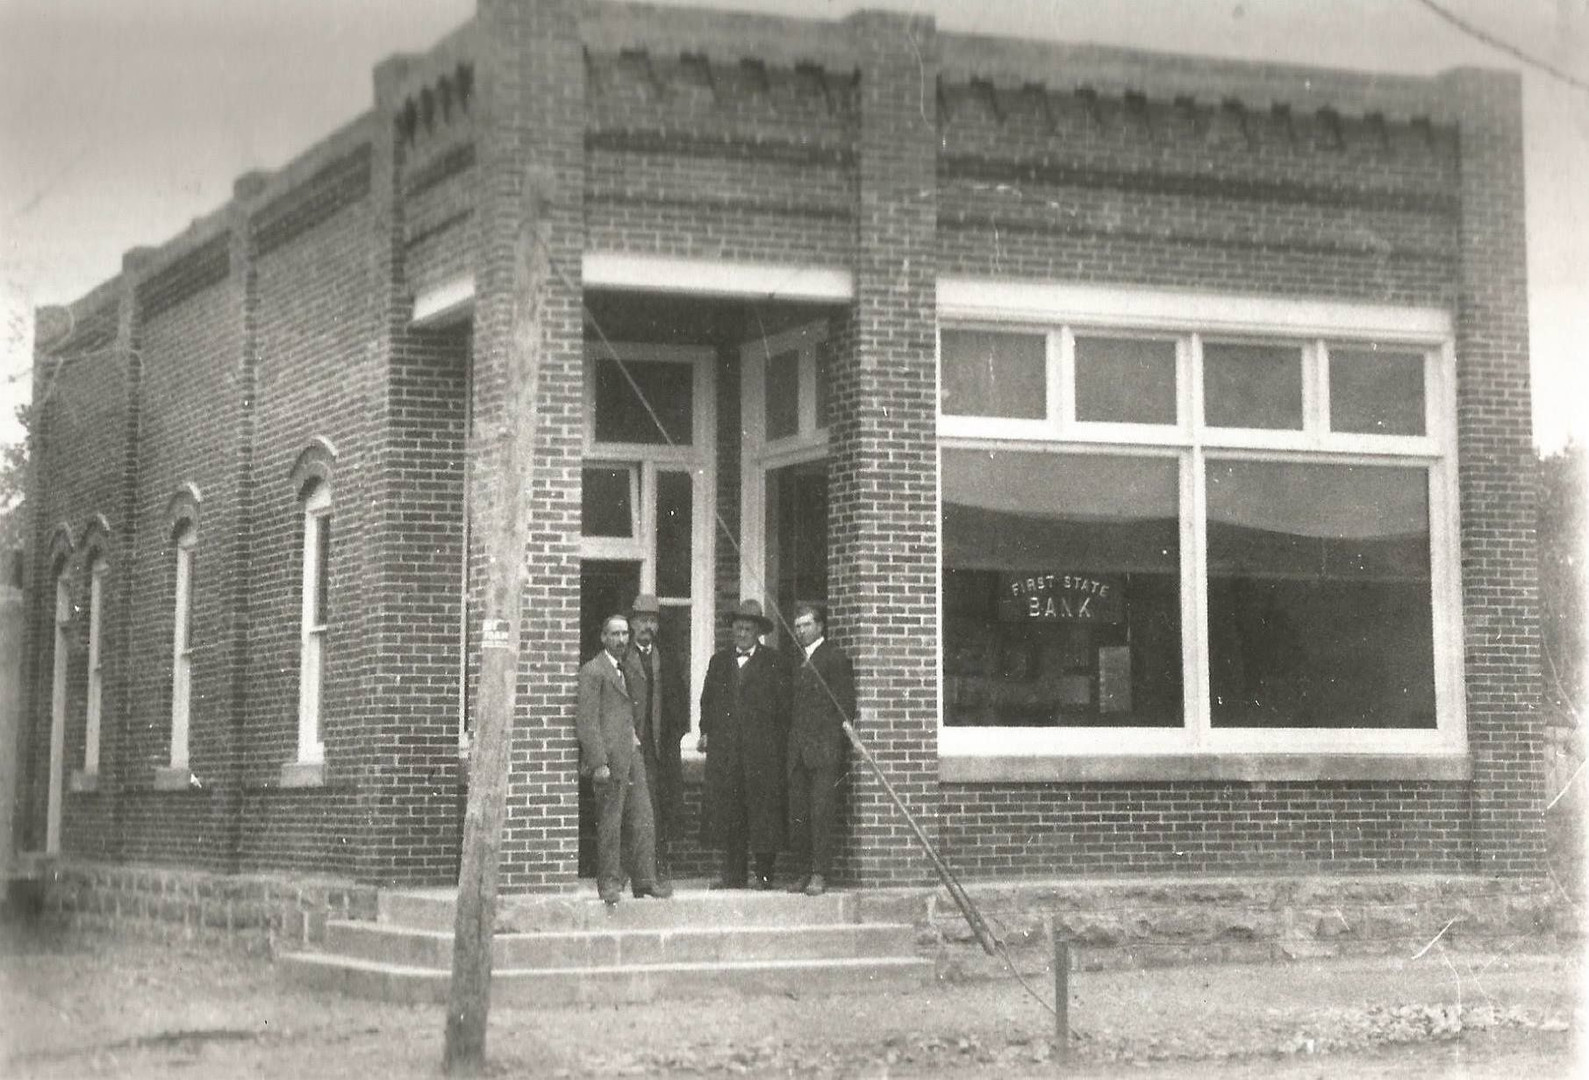 First State Bank of Tularosa.